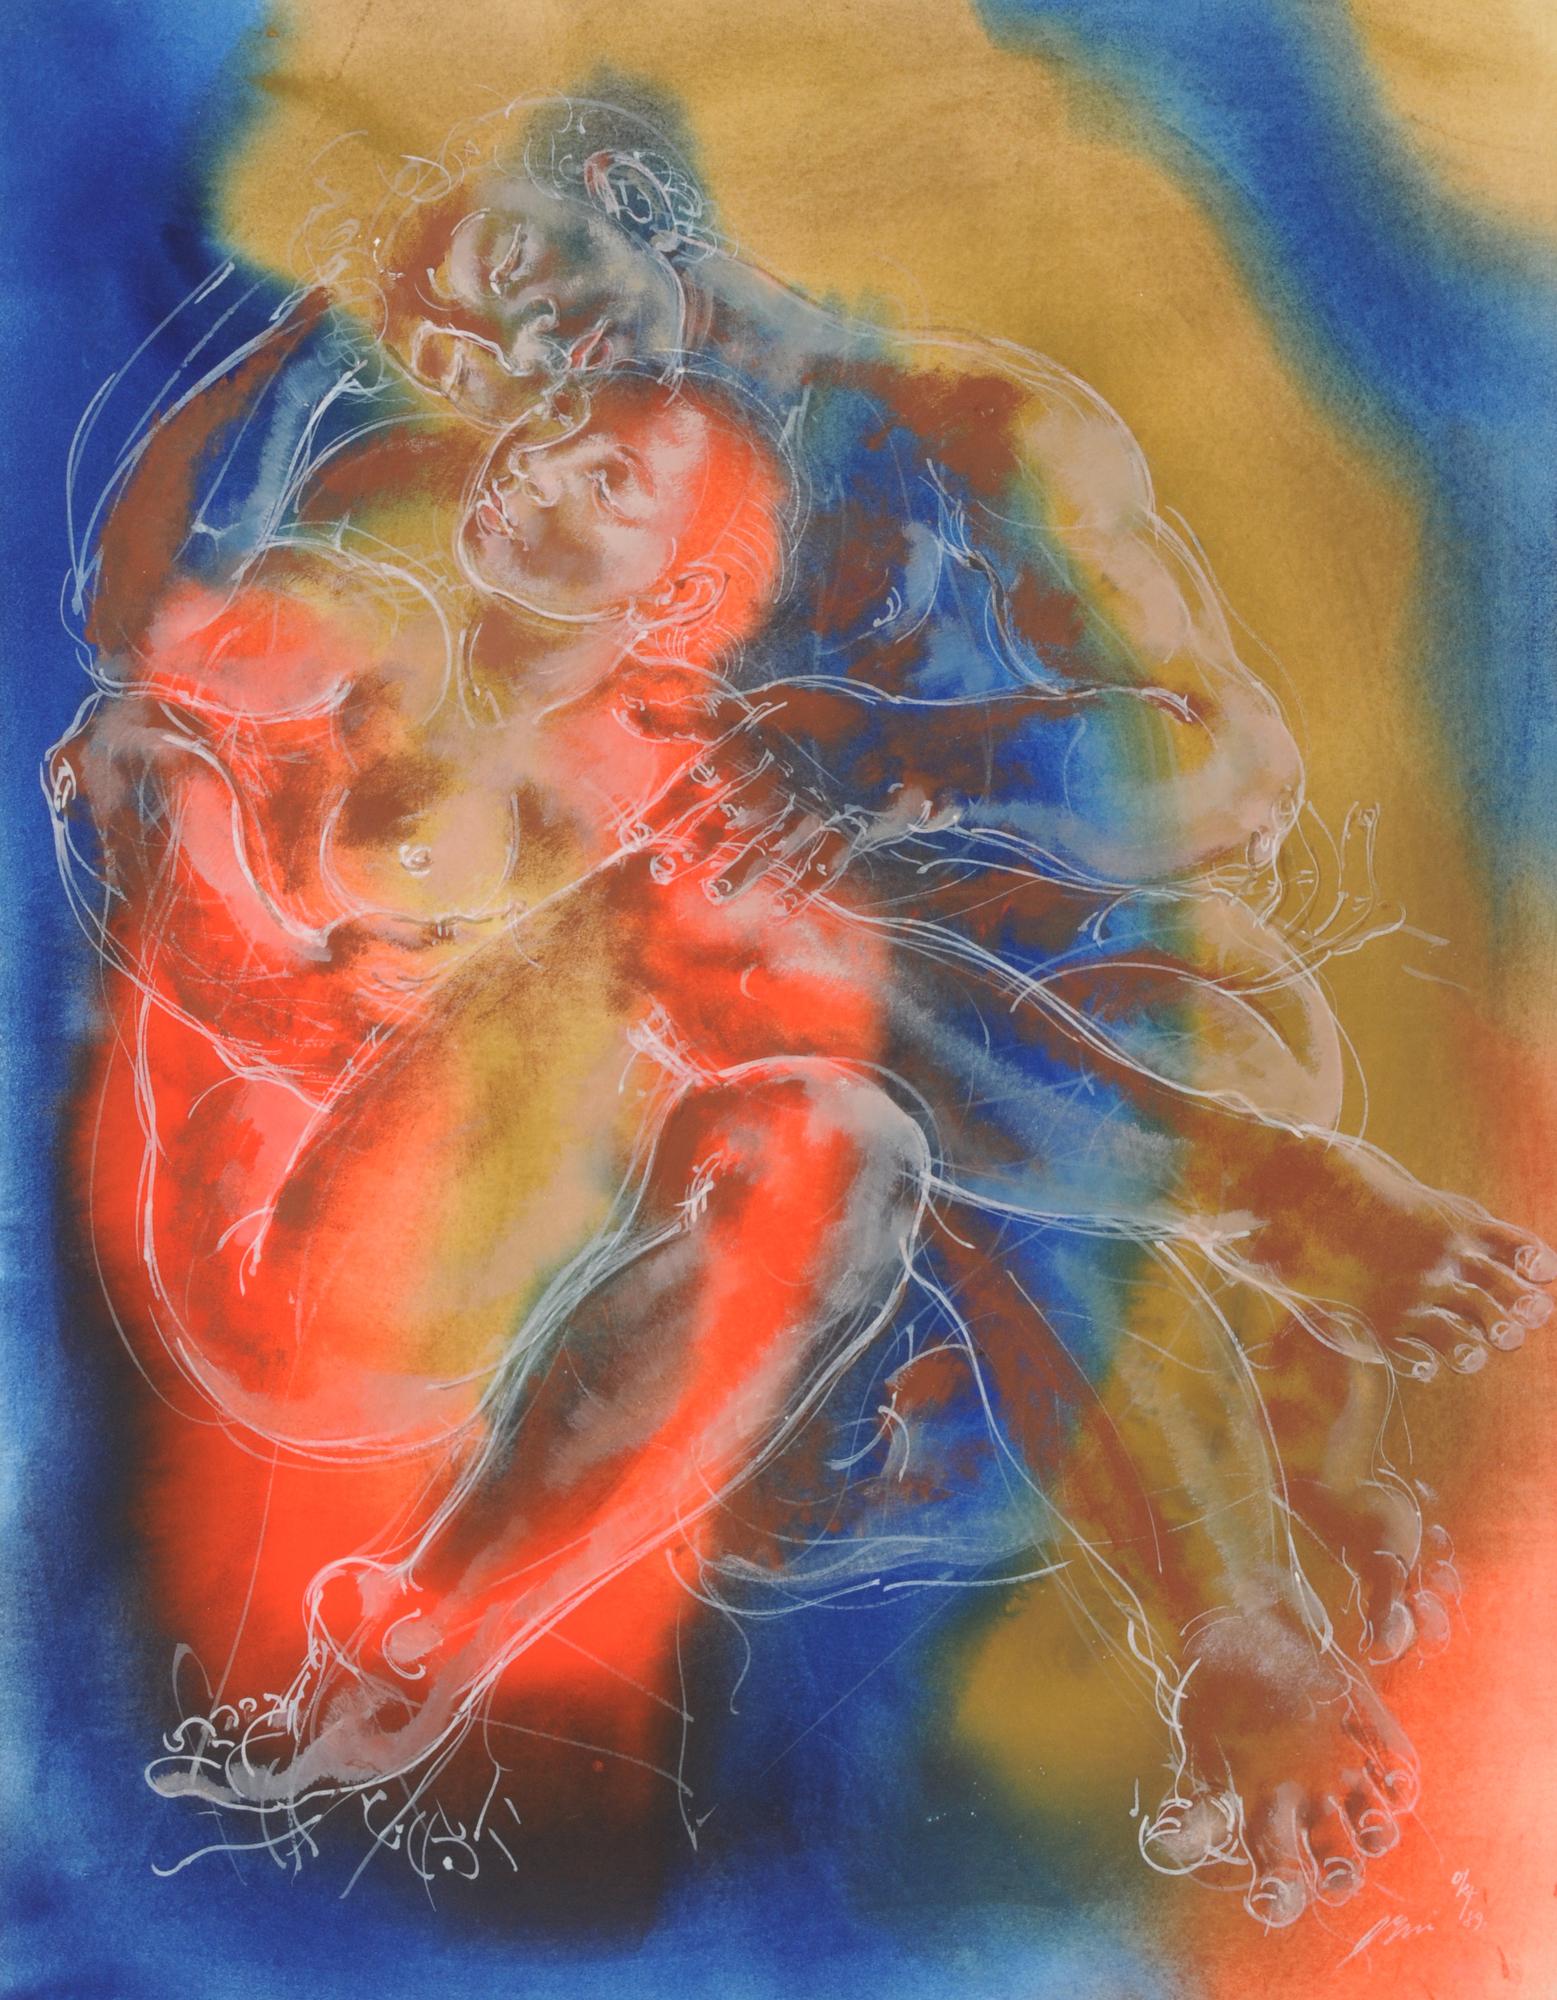 Erni Hans, Sich umarmendes Paar (Embracing Couple)